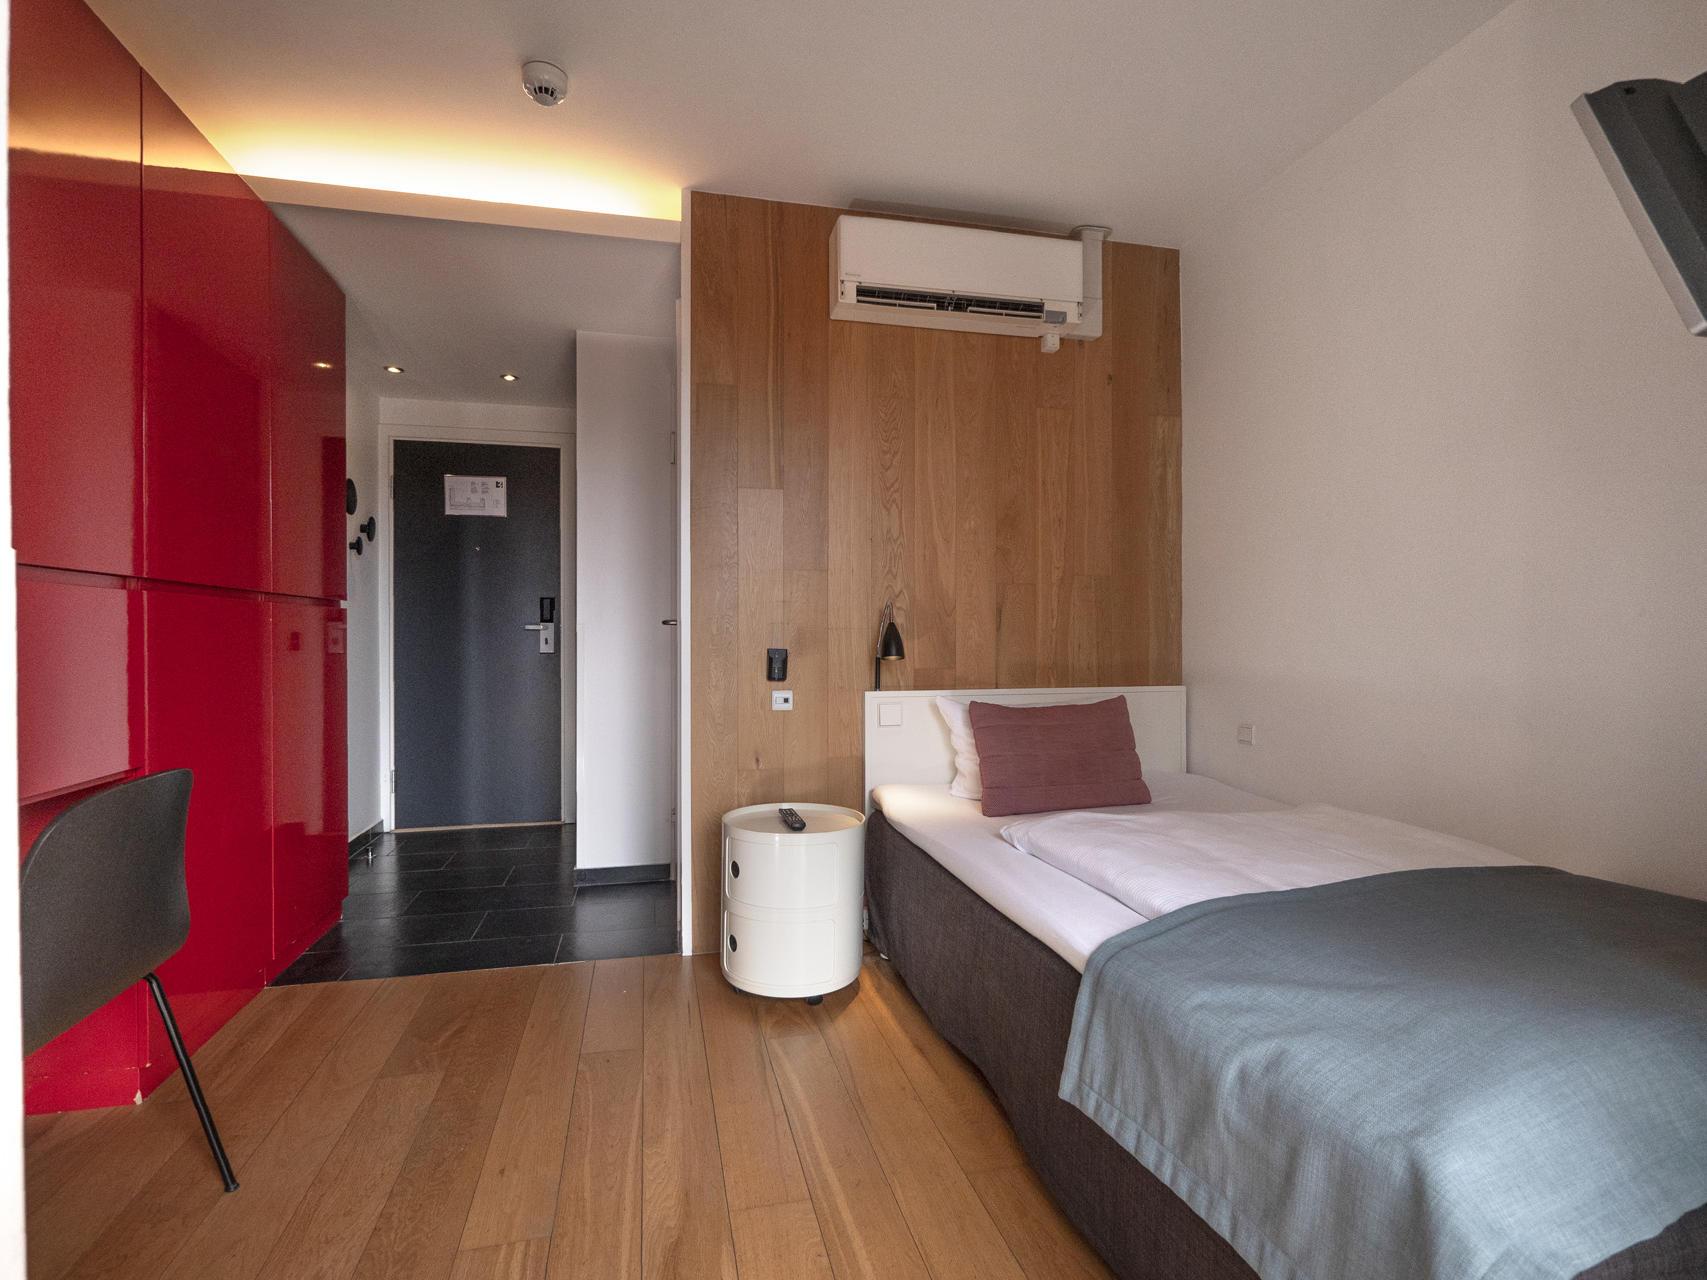 Standard Single Room at Hotel Twentyseven Copenhagen